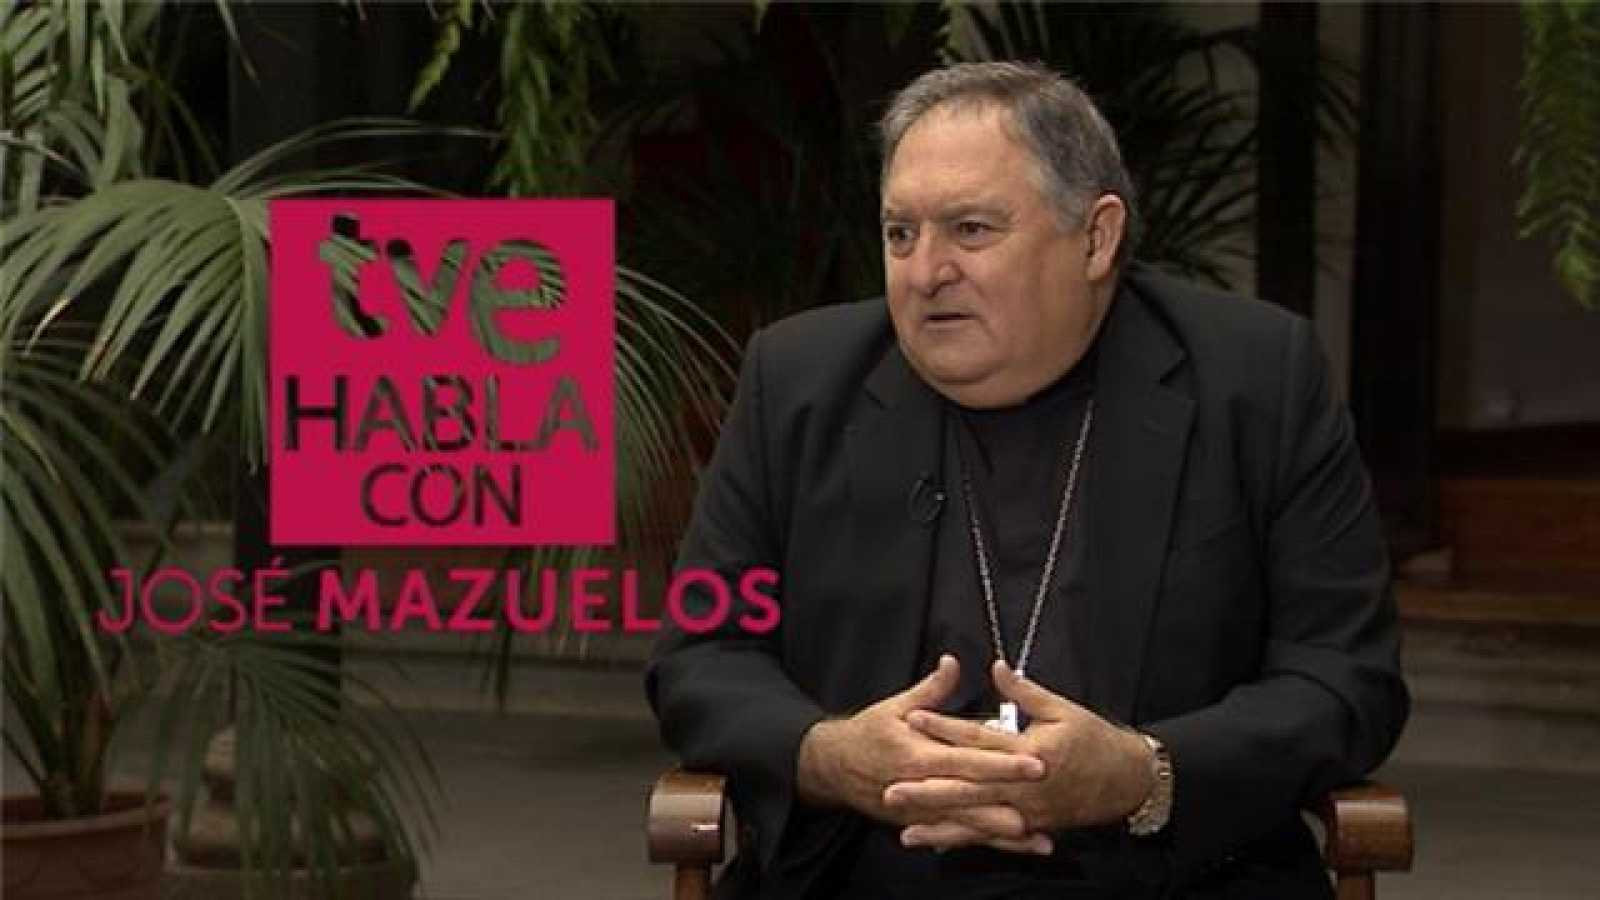 TVE habla con José Mazuelos Pérez - 07/02/2021